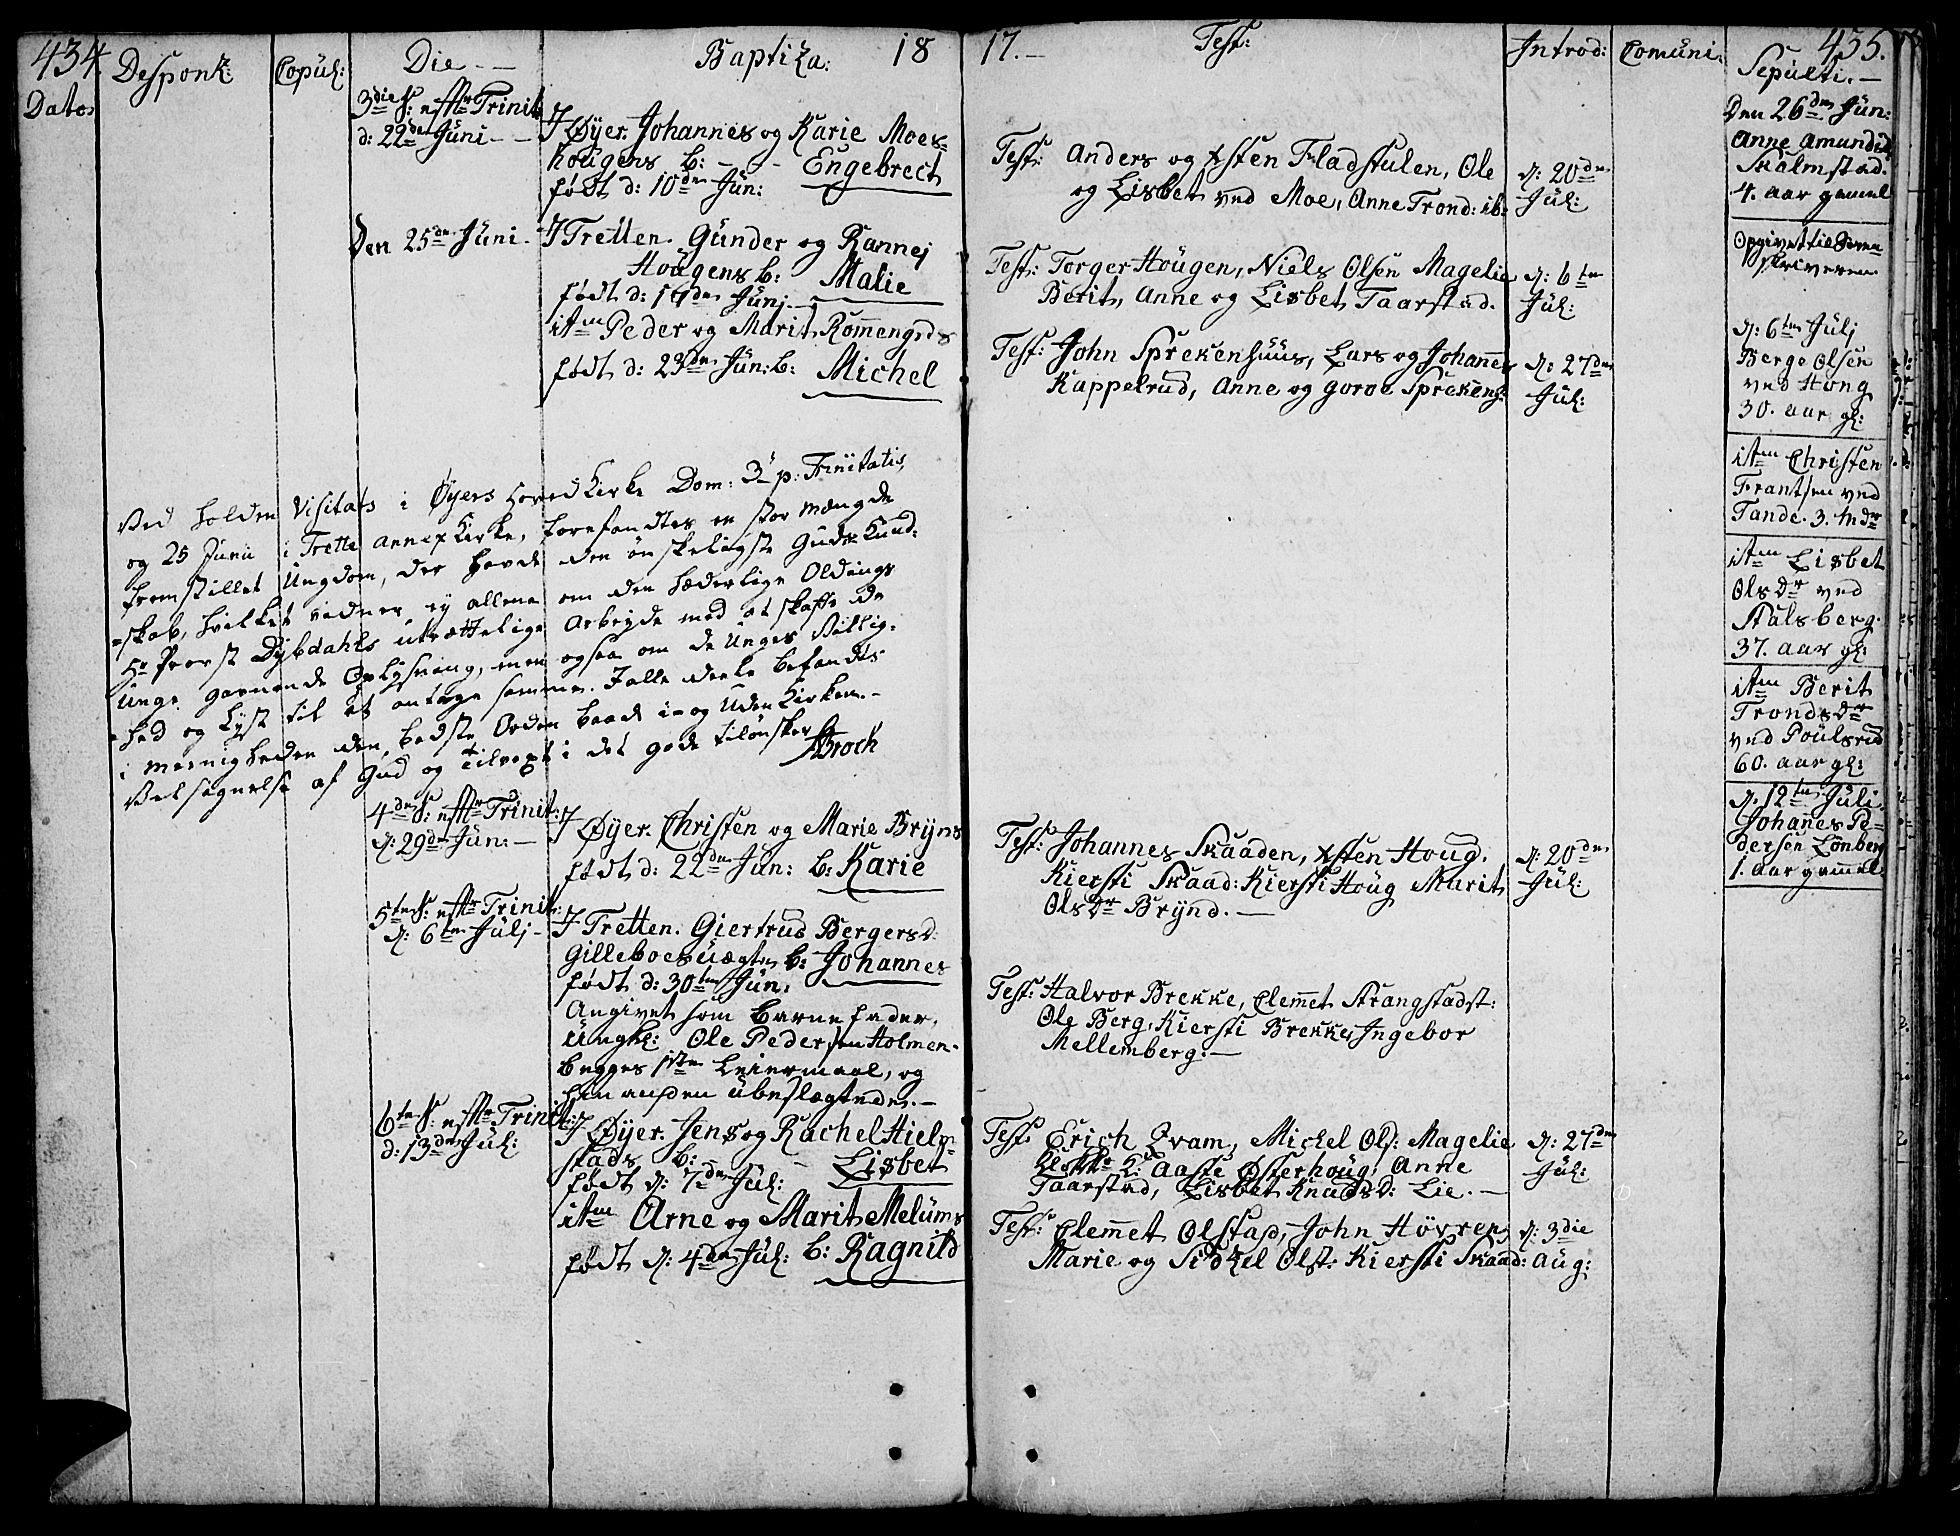 SAH, Øyer prestekontor, Ministerialbok nr. 3, 1784-1824, s. 434-435